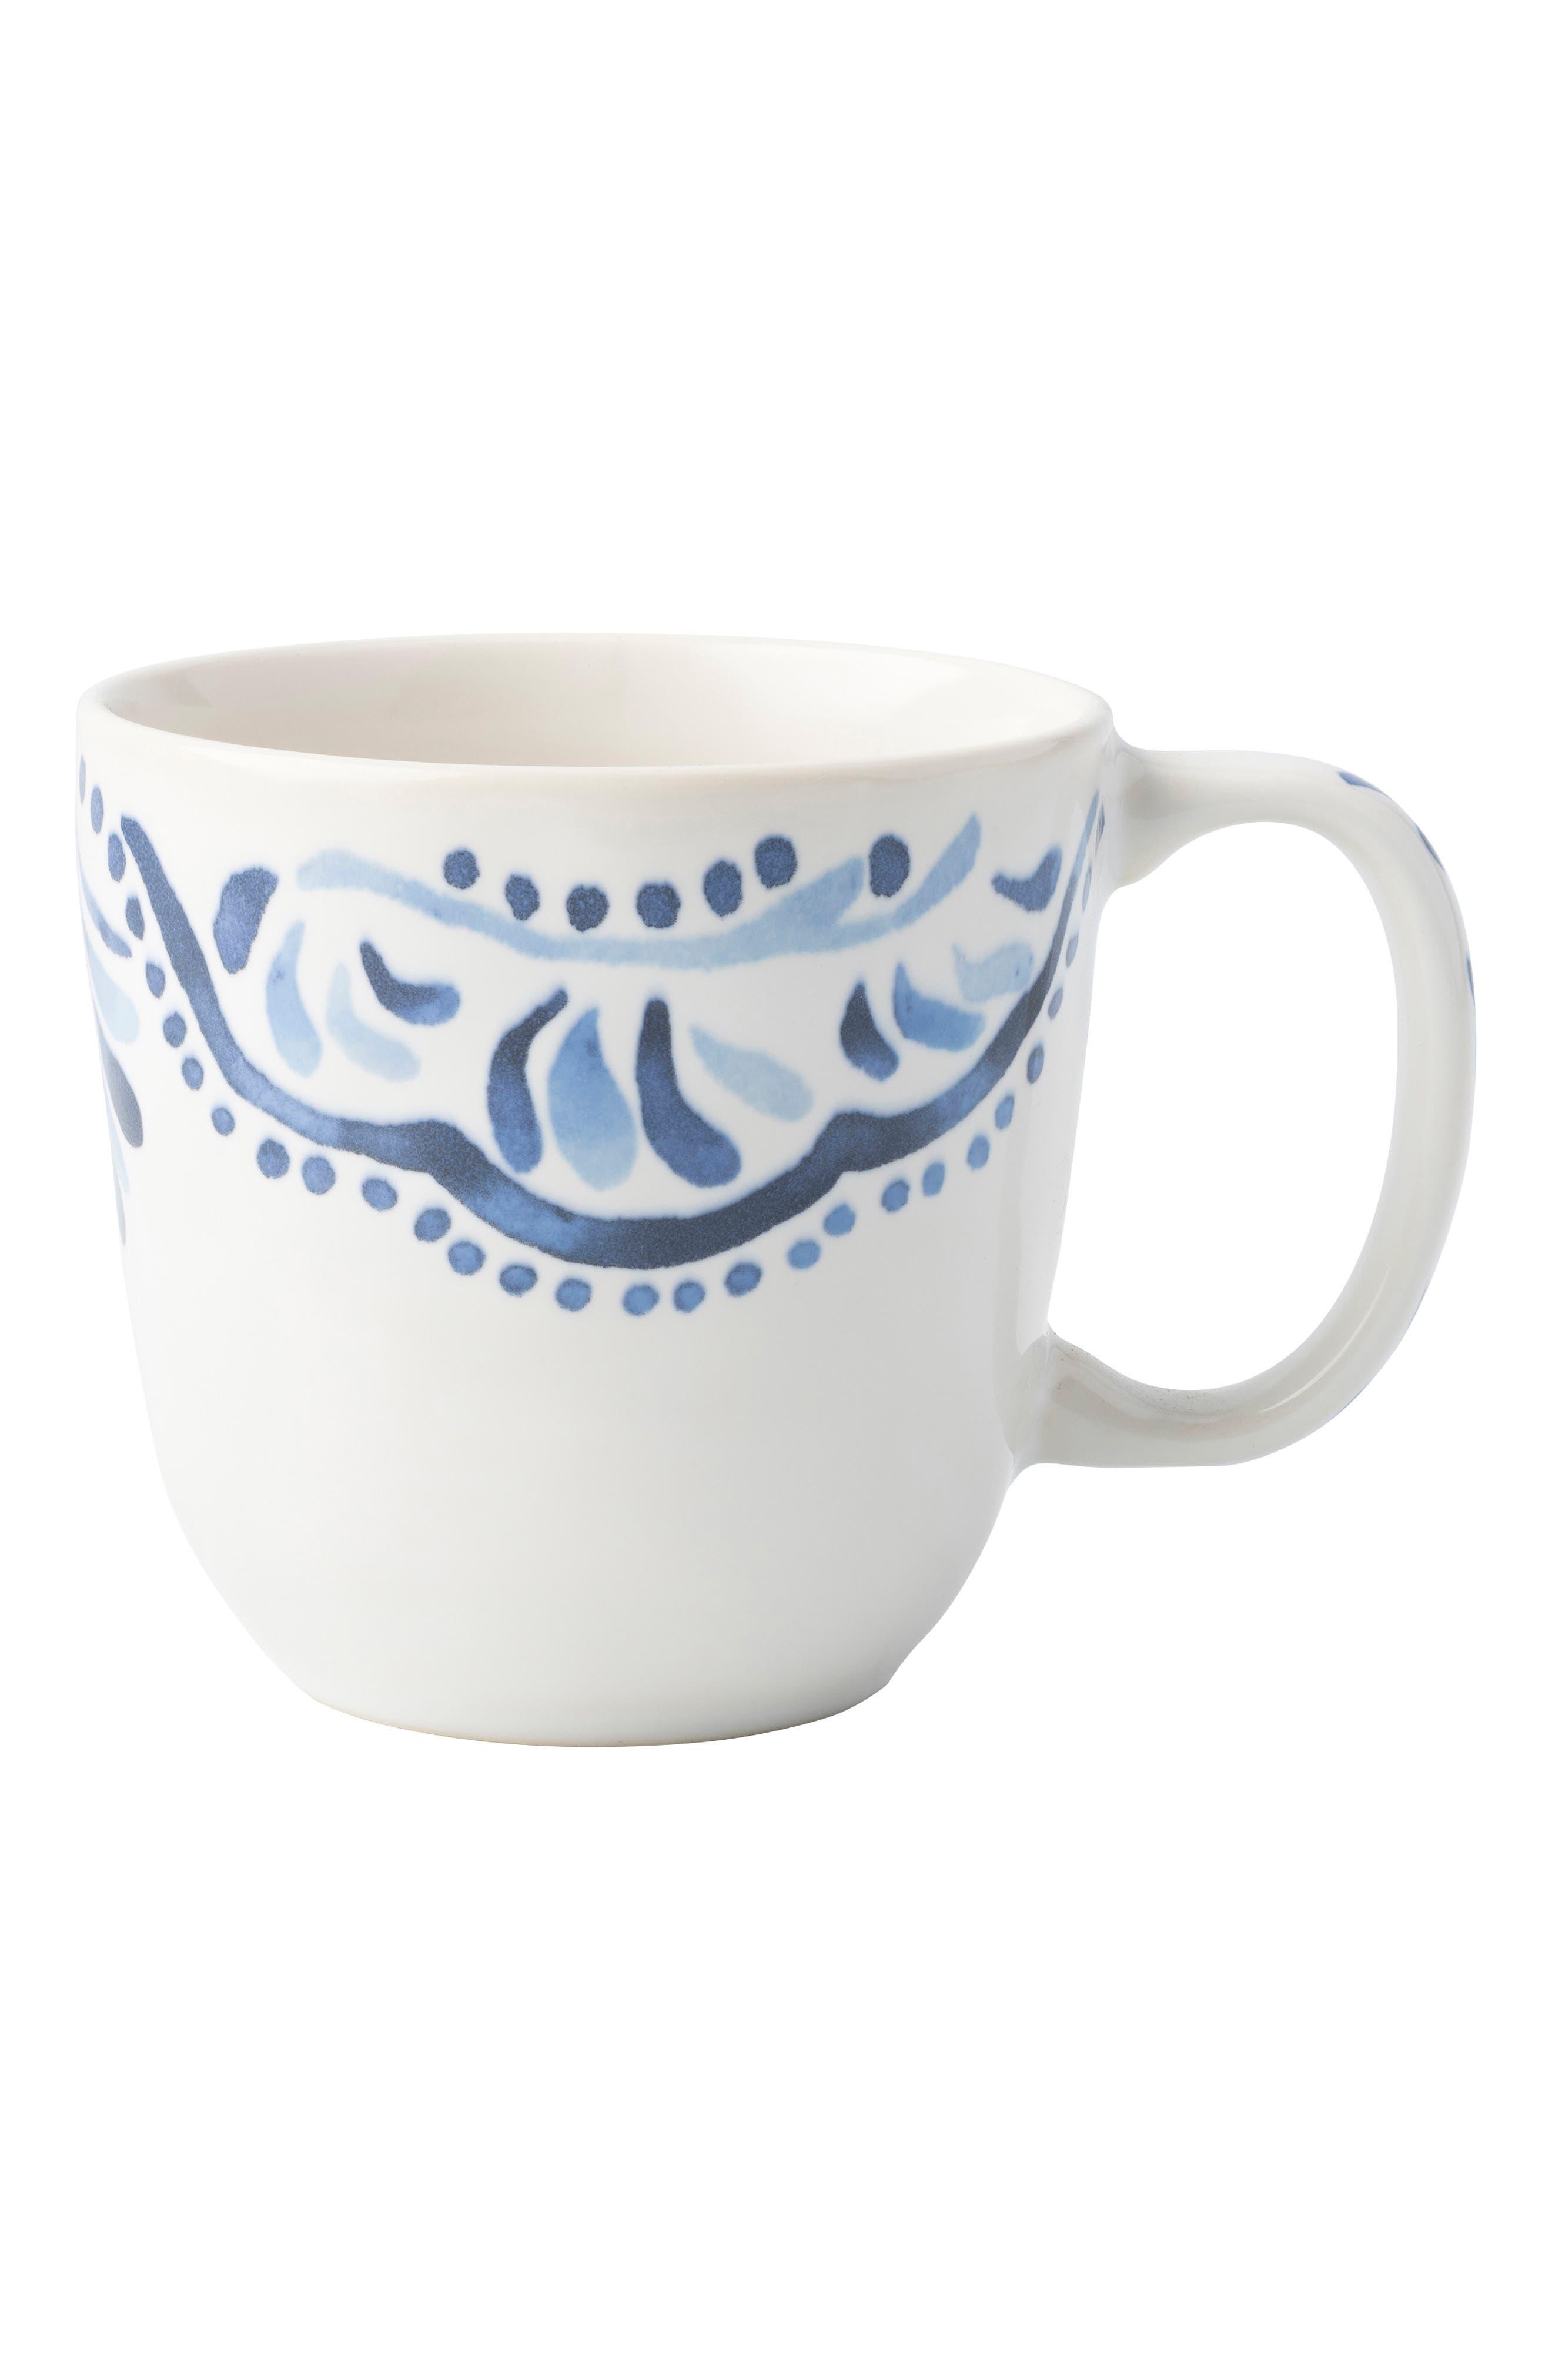 Wanderlust Collection - Iberian Journey Ceramic Coffee/Tea Cup,                         Main,                         color, INDIGO